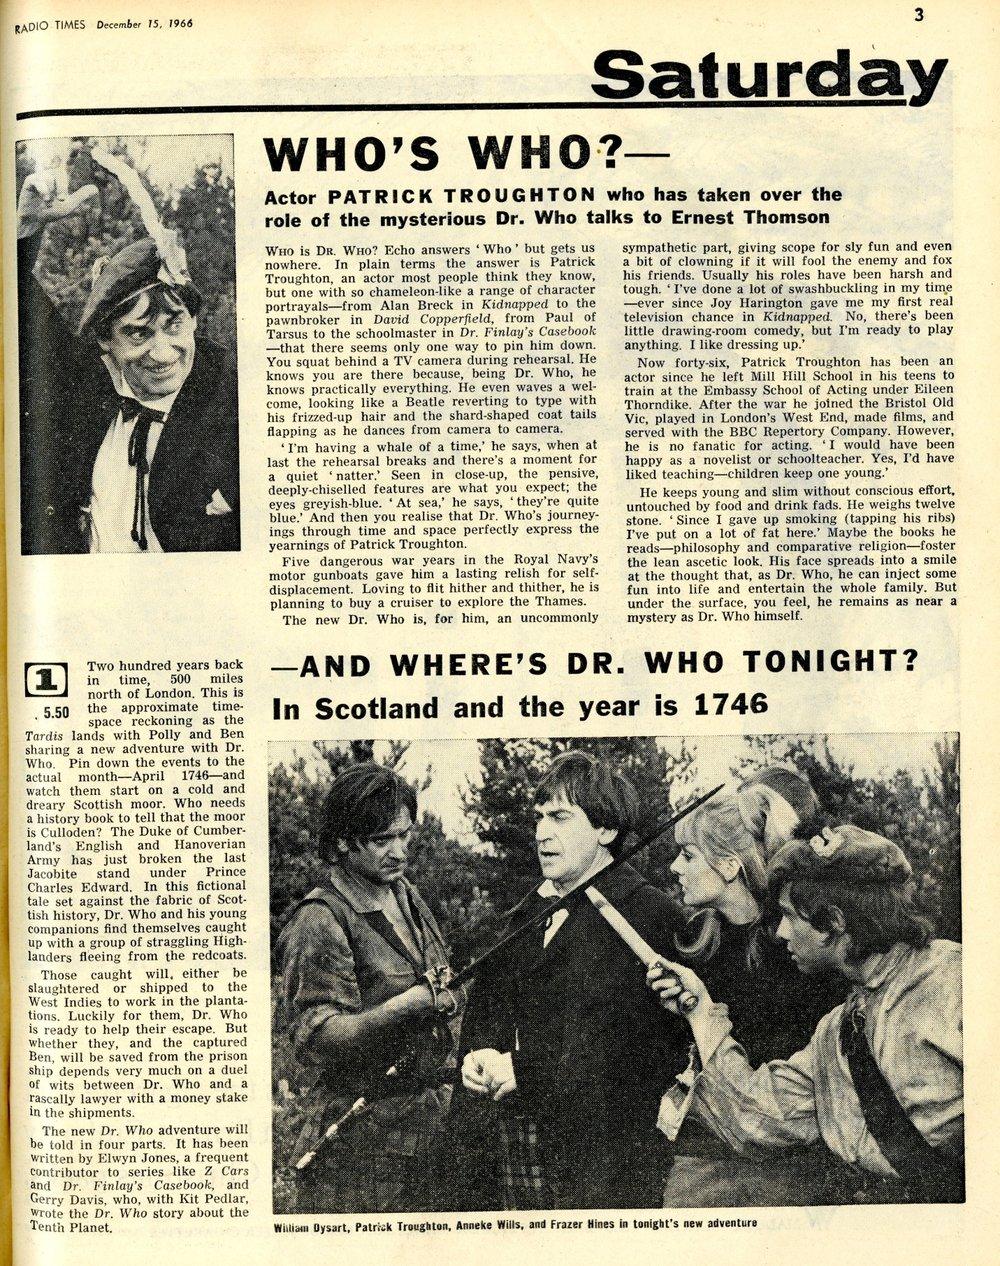 Radio Times, 17-23 December 1966